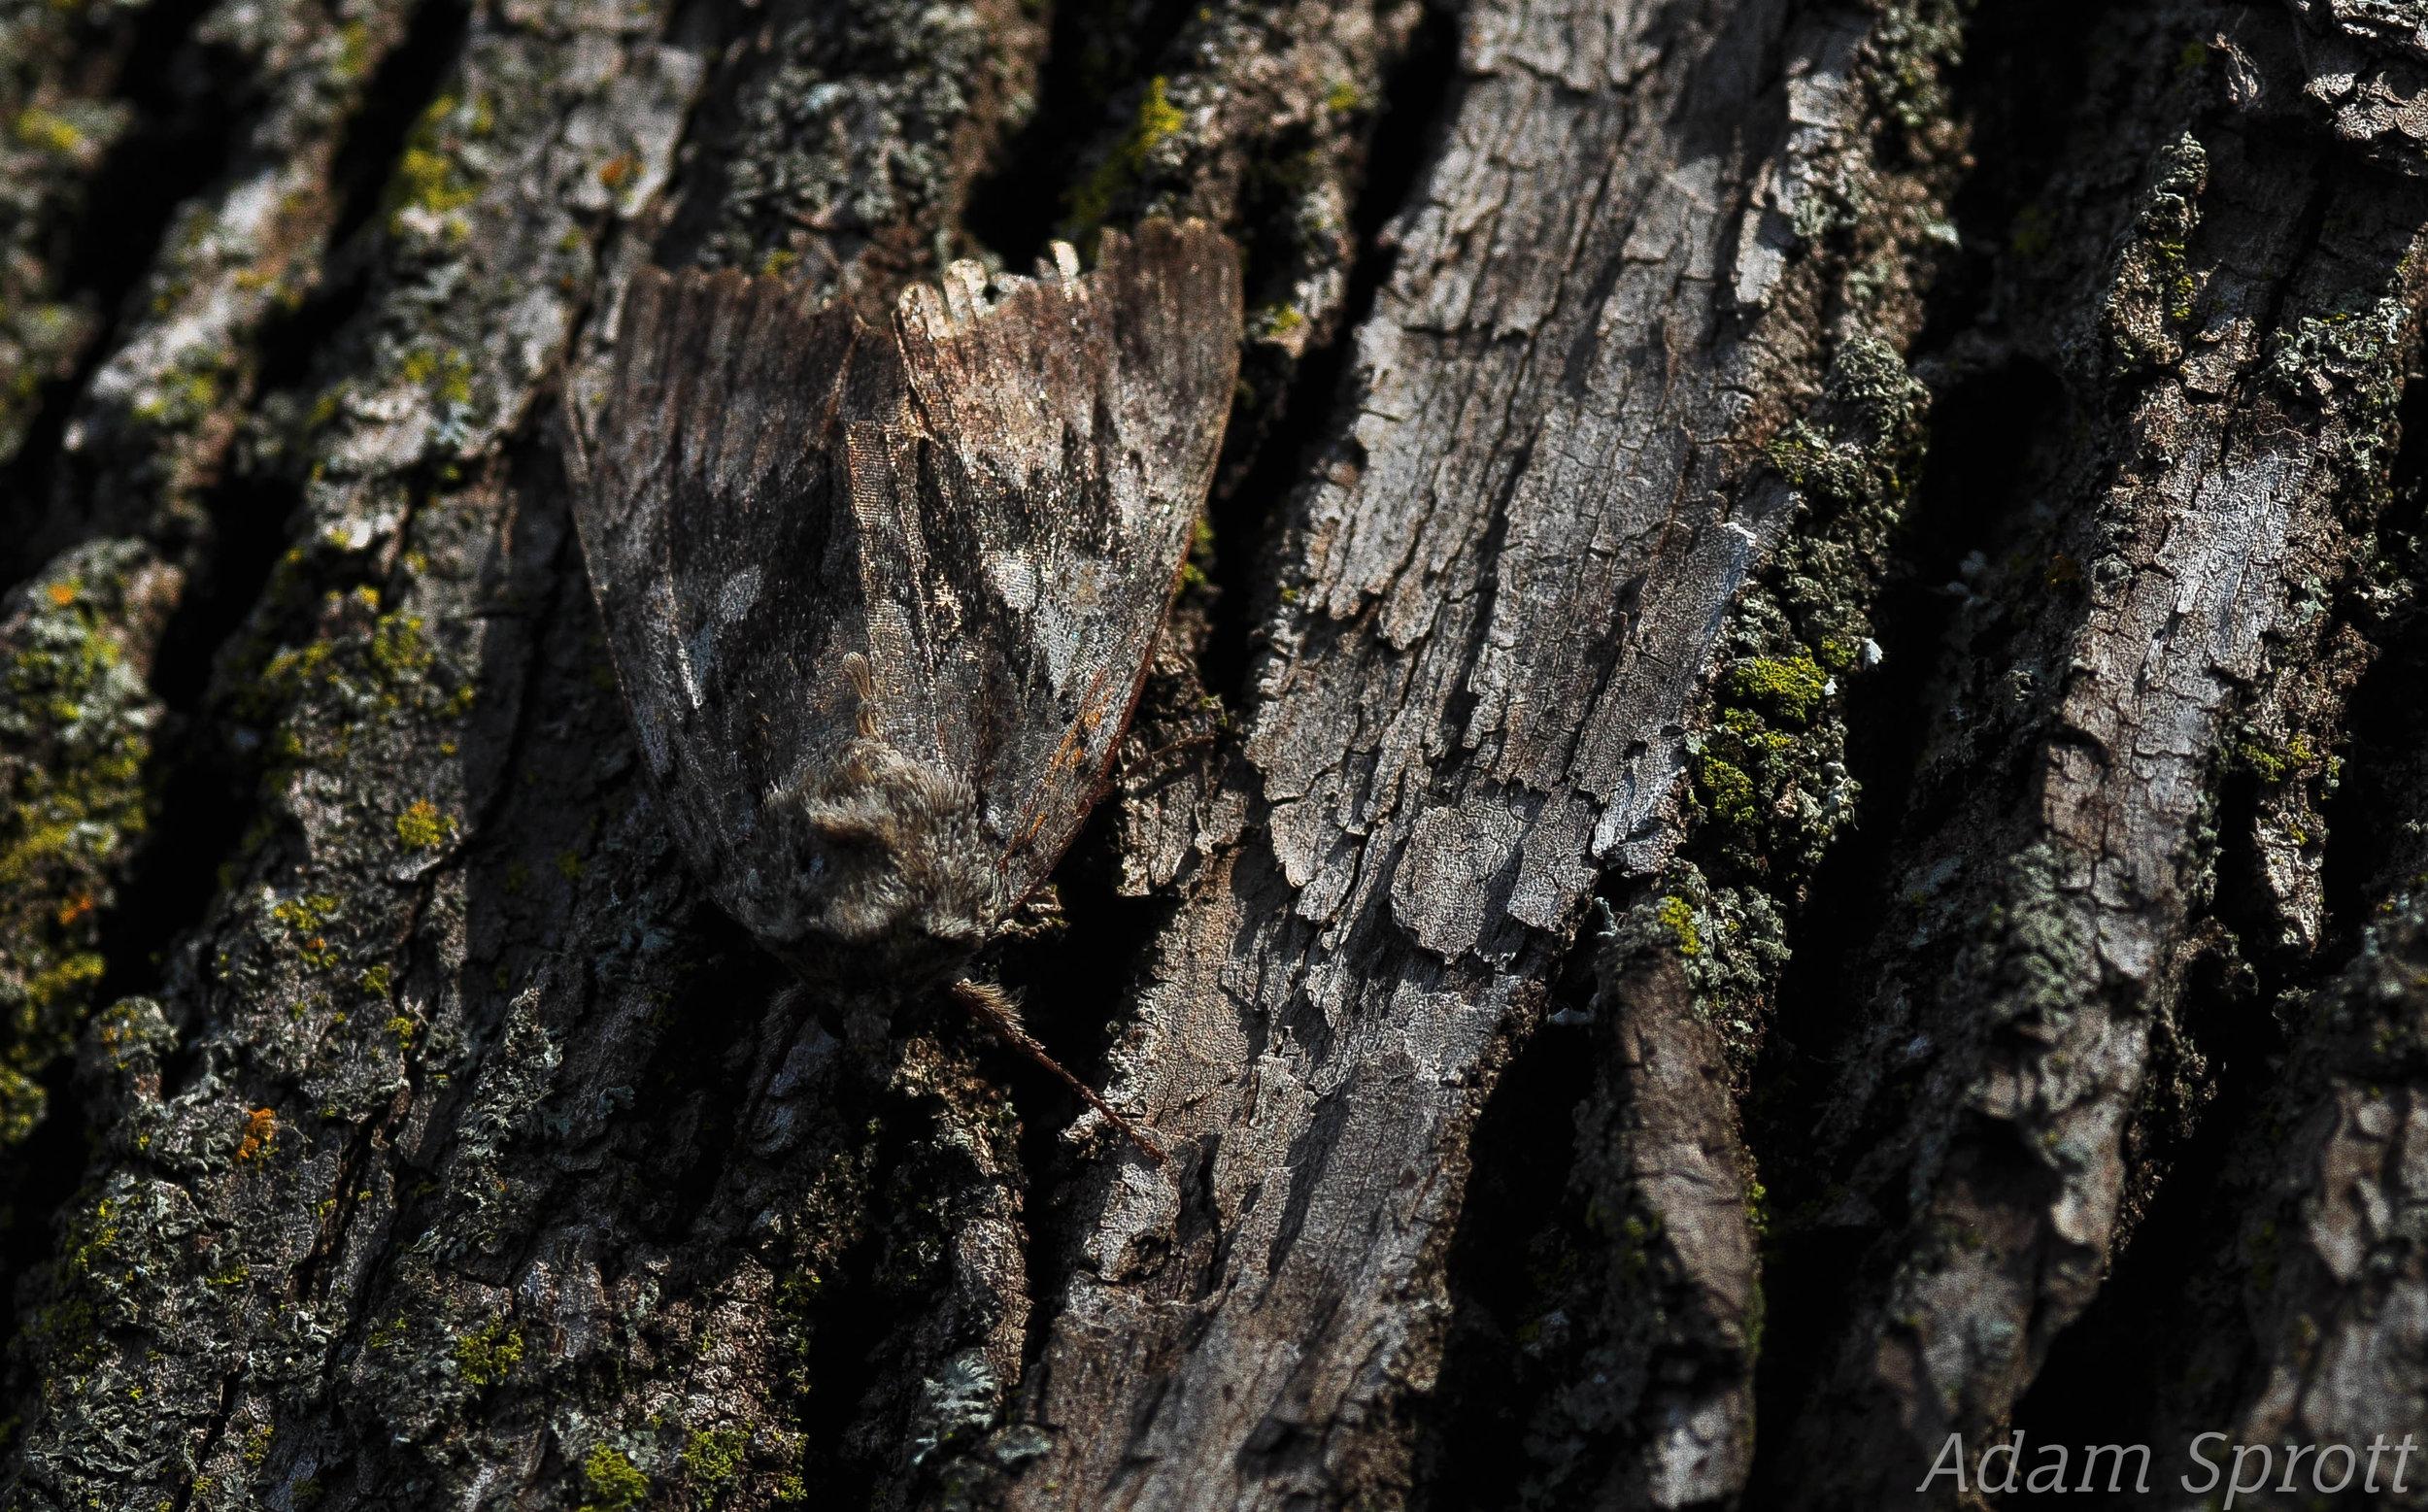 5.6 Lepidoptera 1 - Confused Woodgrain (Morrisonia confusa).jpg